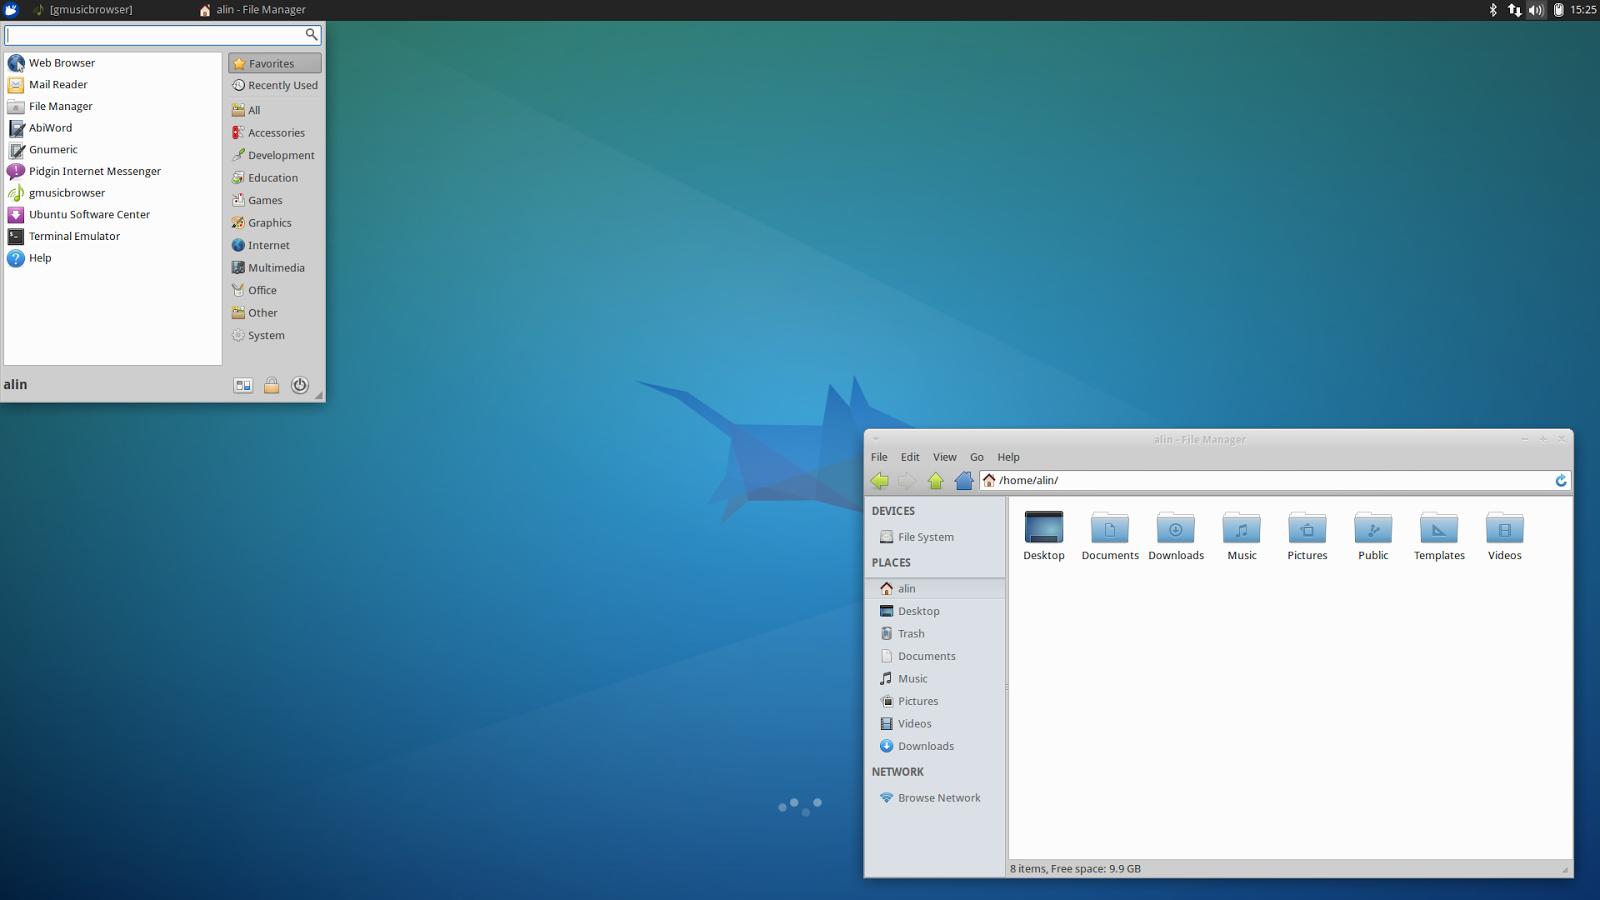 Xubuntu 14.04 LTS desktop